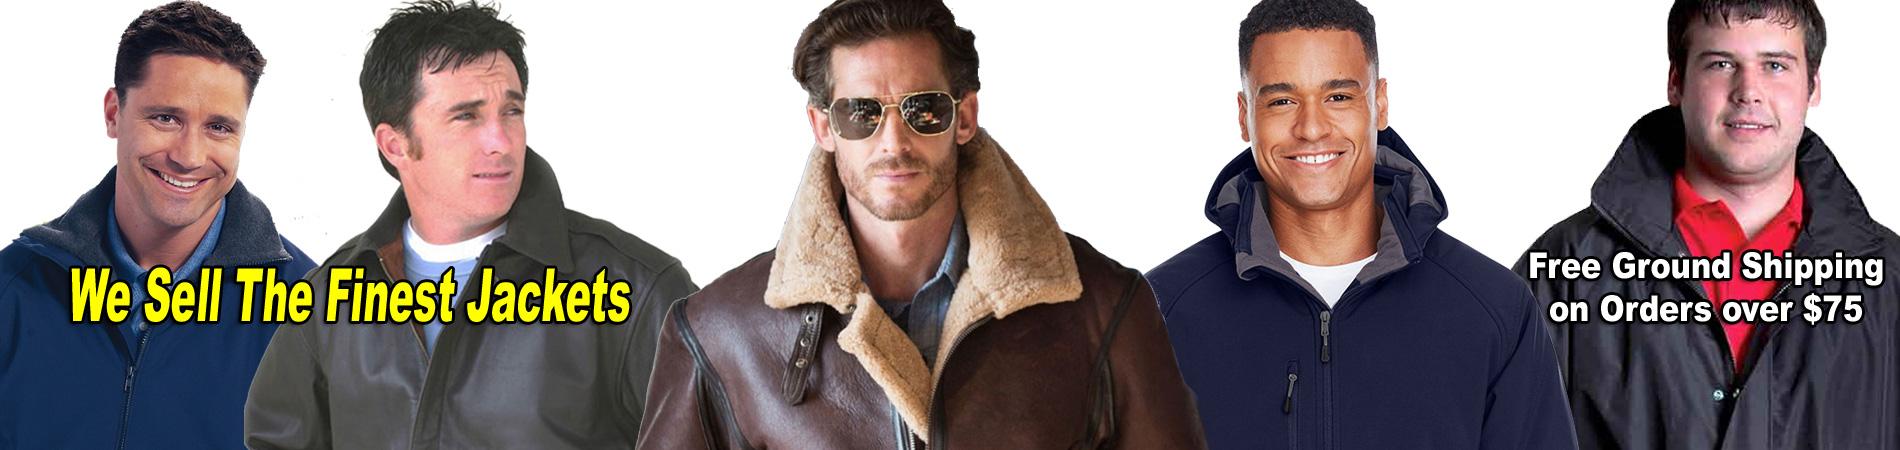 Leather Bomber Jackets, Nylon Bomber Jacket, Duck Jackets, Hunting Camo Jackets, Parkas, Tee Shirts, Hoodies.